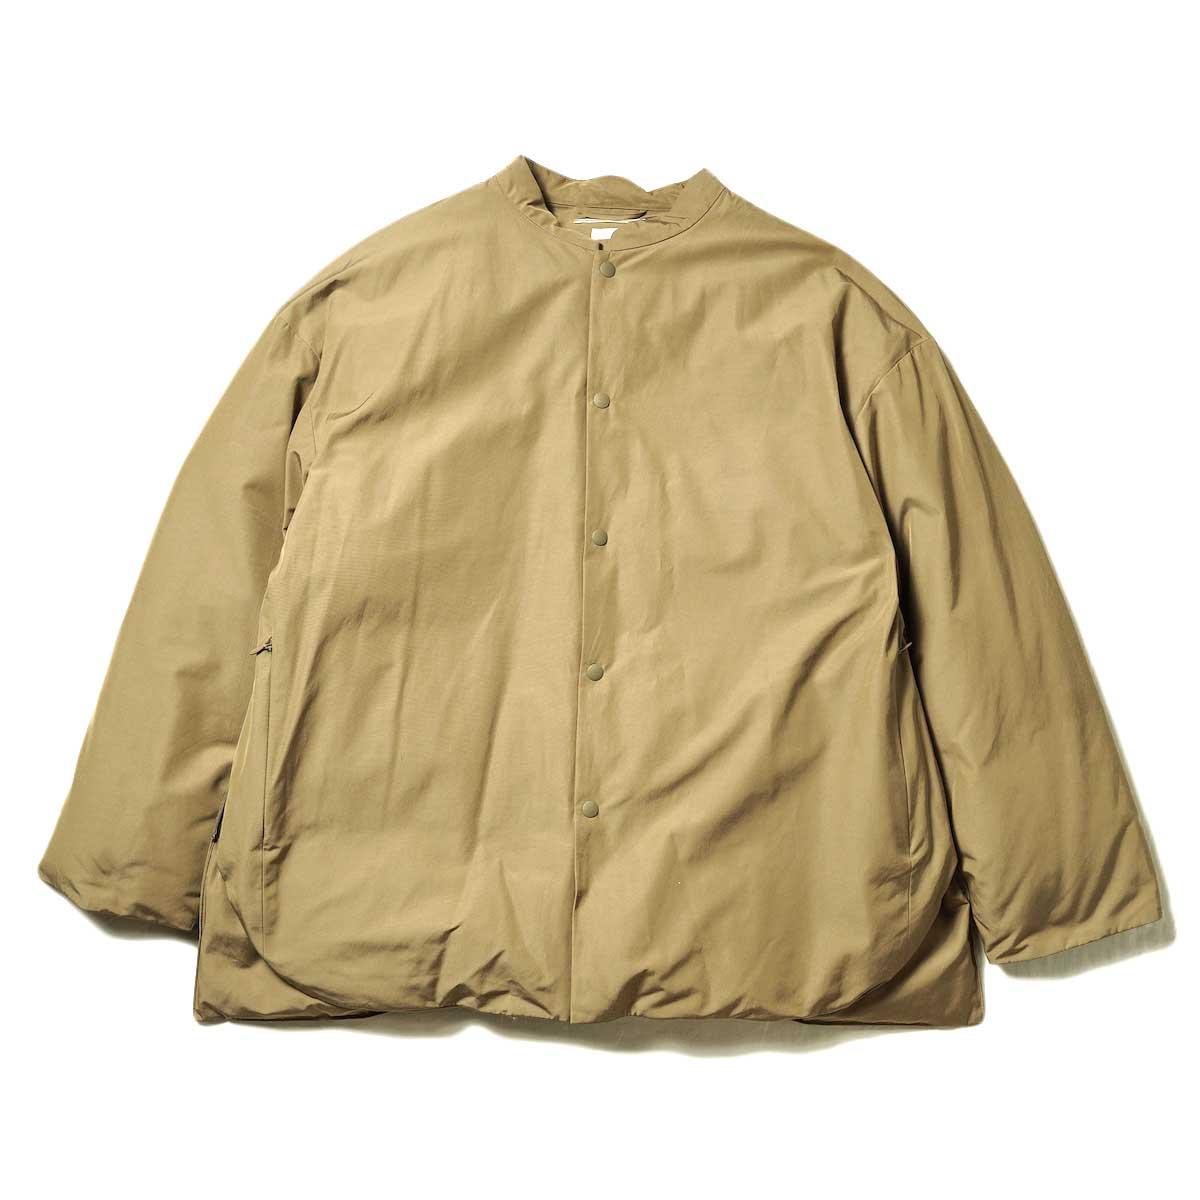 blurhms / Stand-up Collar Down Jacket (Khaki Beige)